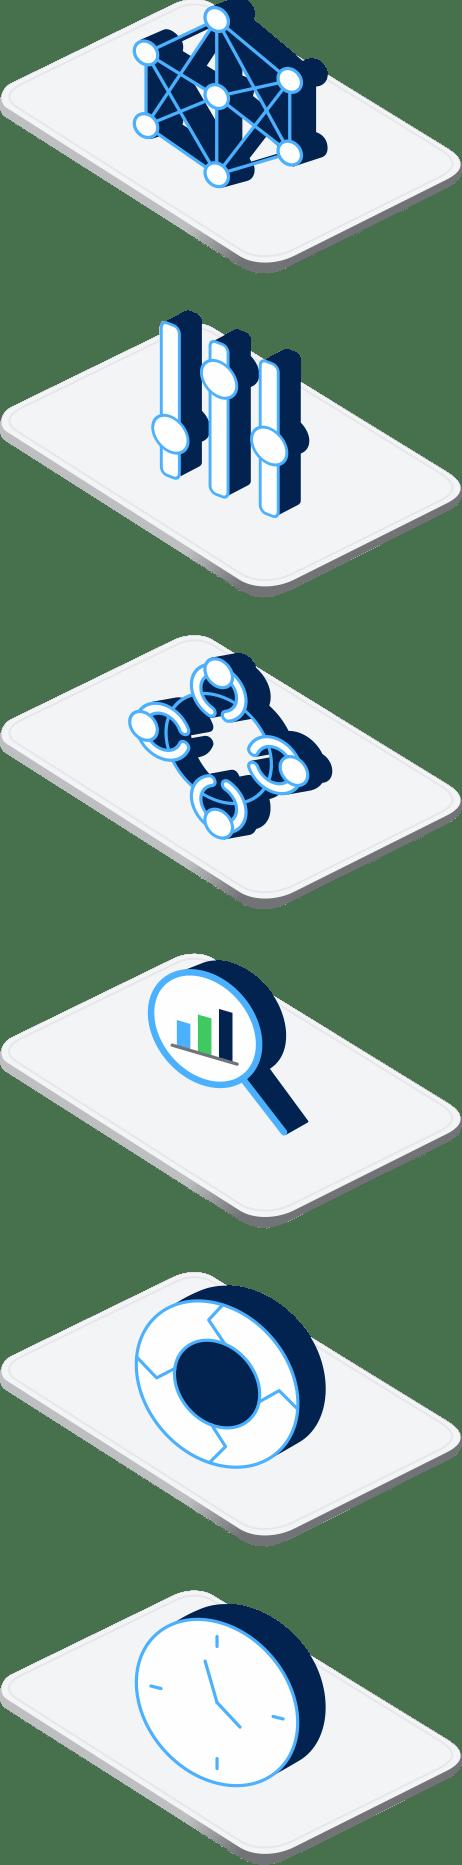 Sprite health platform components